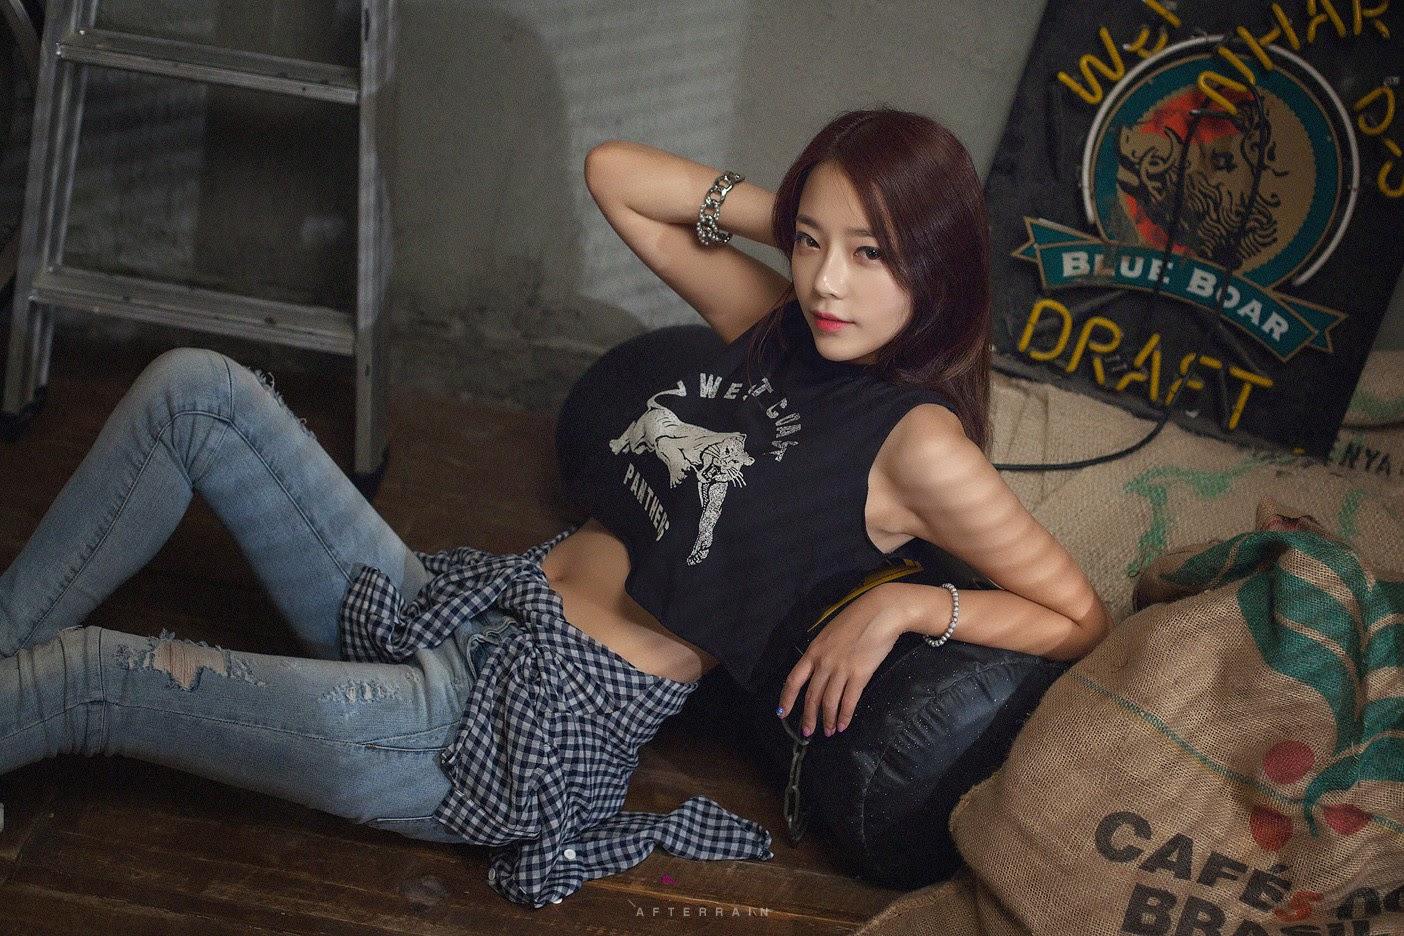 3 The wonderful Ji Yeon in 3 new sets - very cute asian girl - girlcute4u.blogspot.com